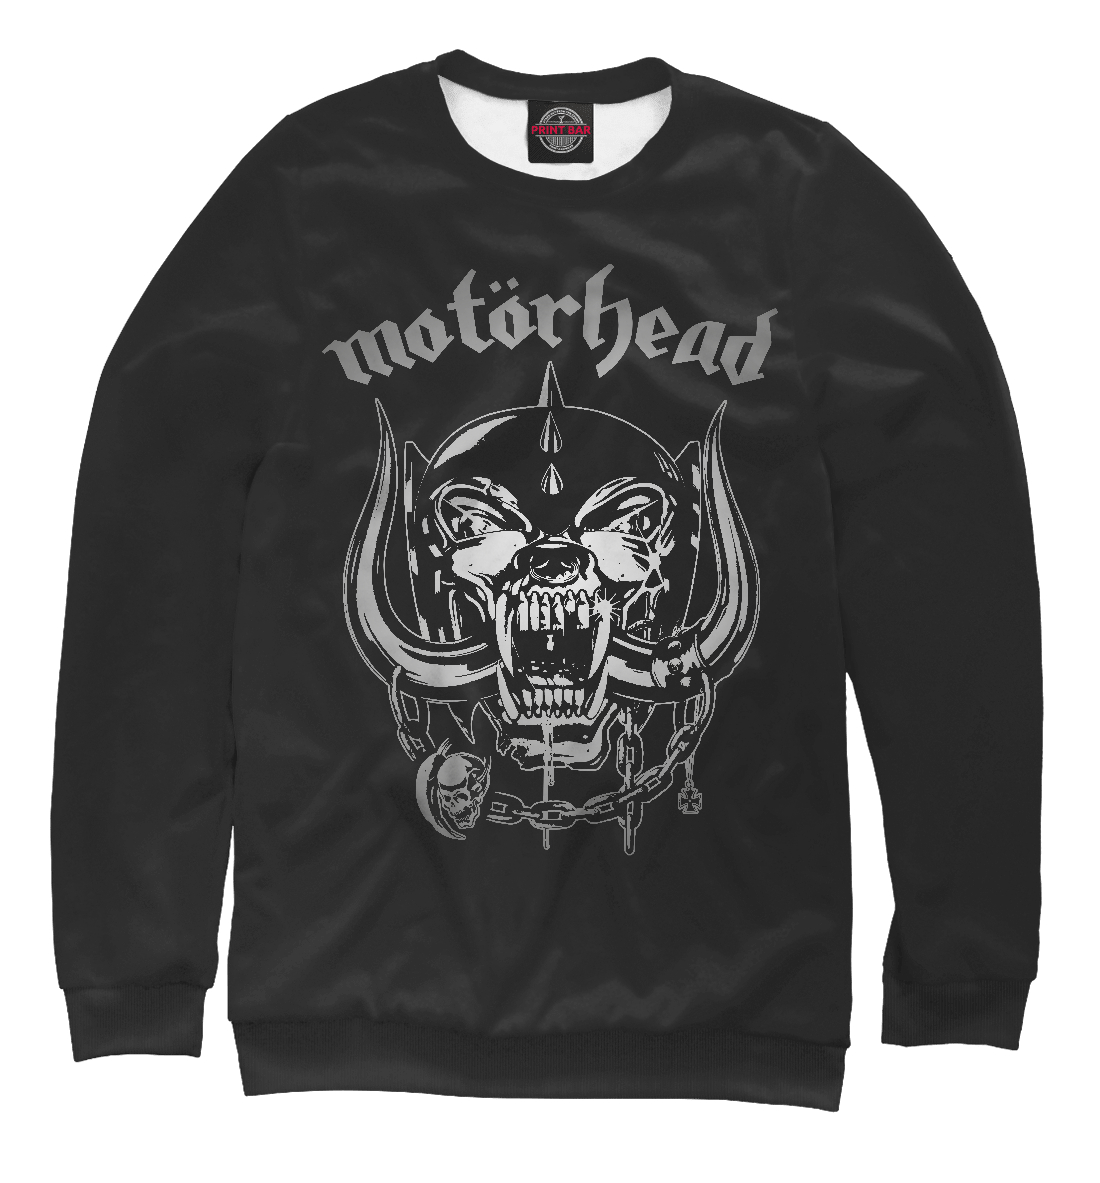 Купить Motorhead, Printbar, Свитшоты, MOT-685592-swi-1